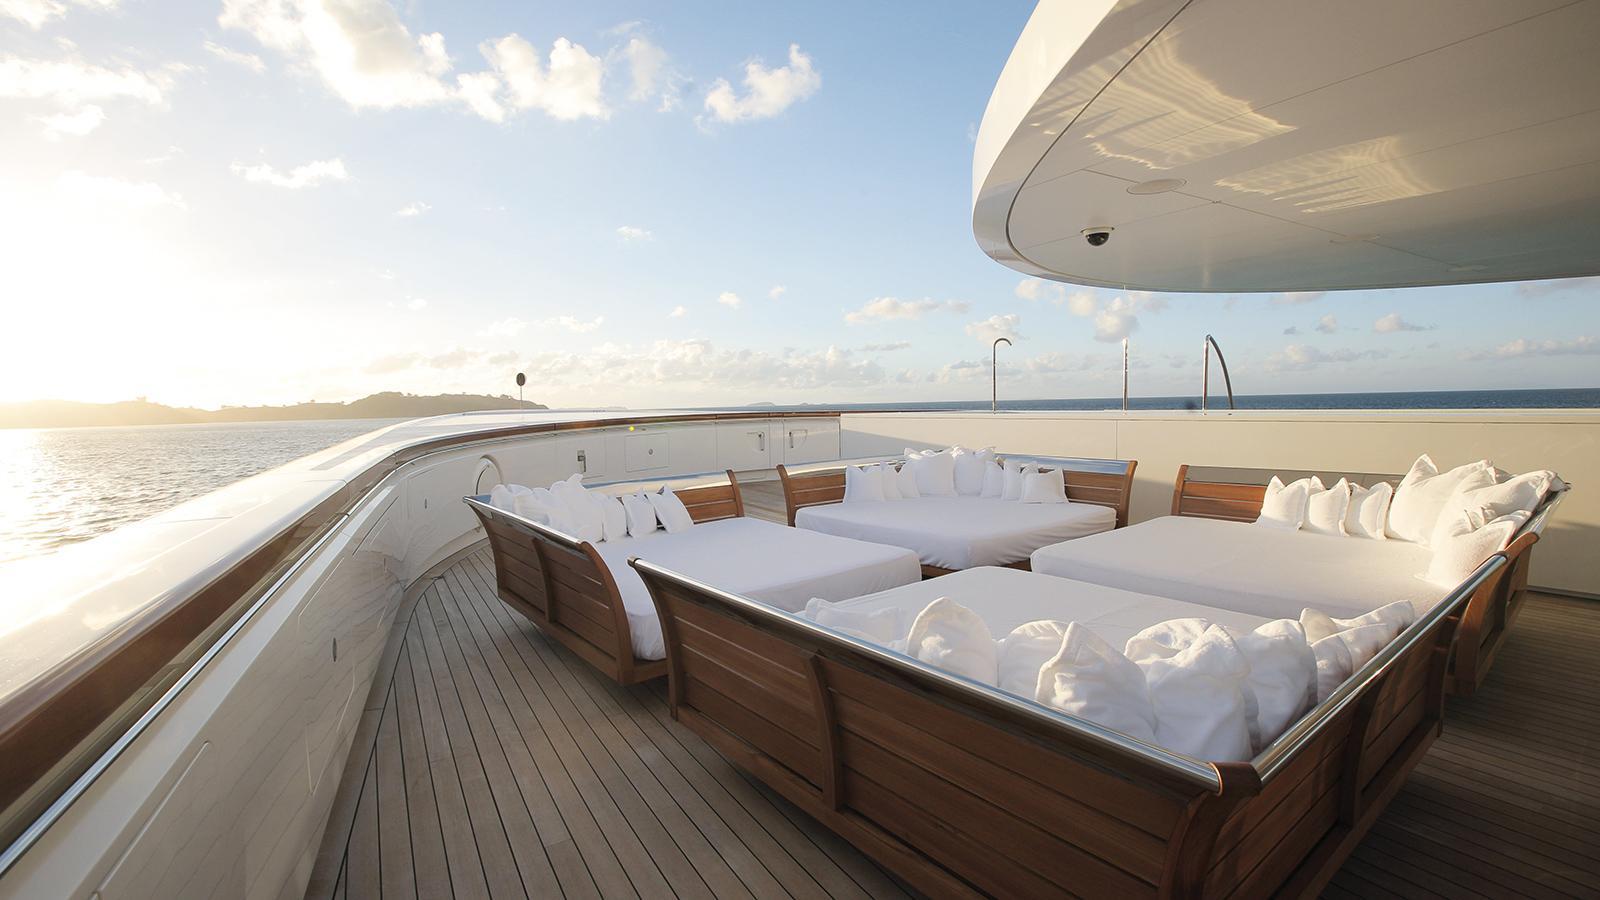 superyacht-a-motor-yacht-blohm-voss-2008-119m-foredeck